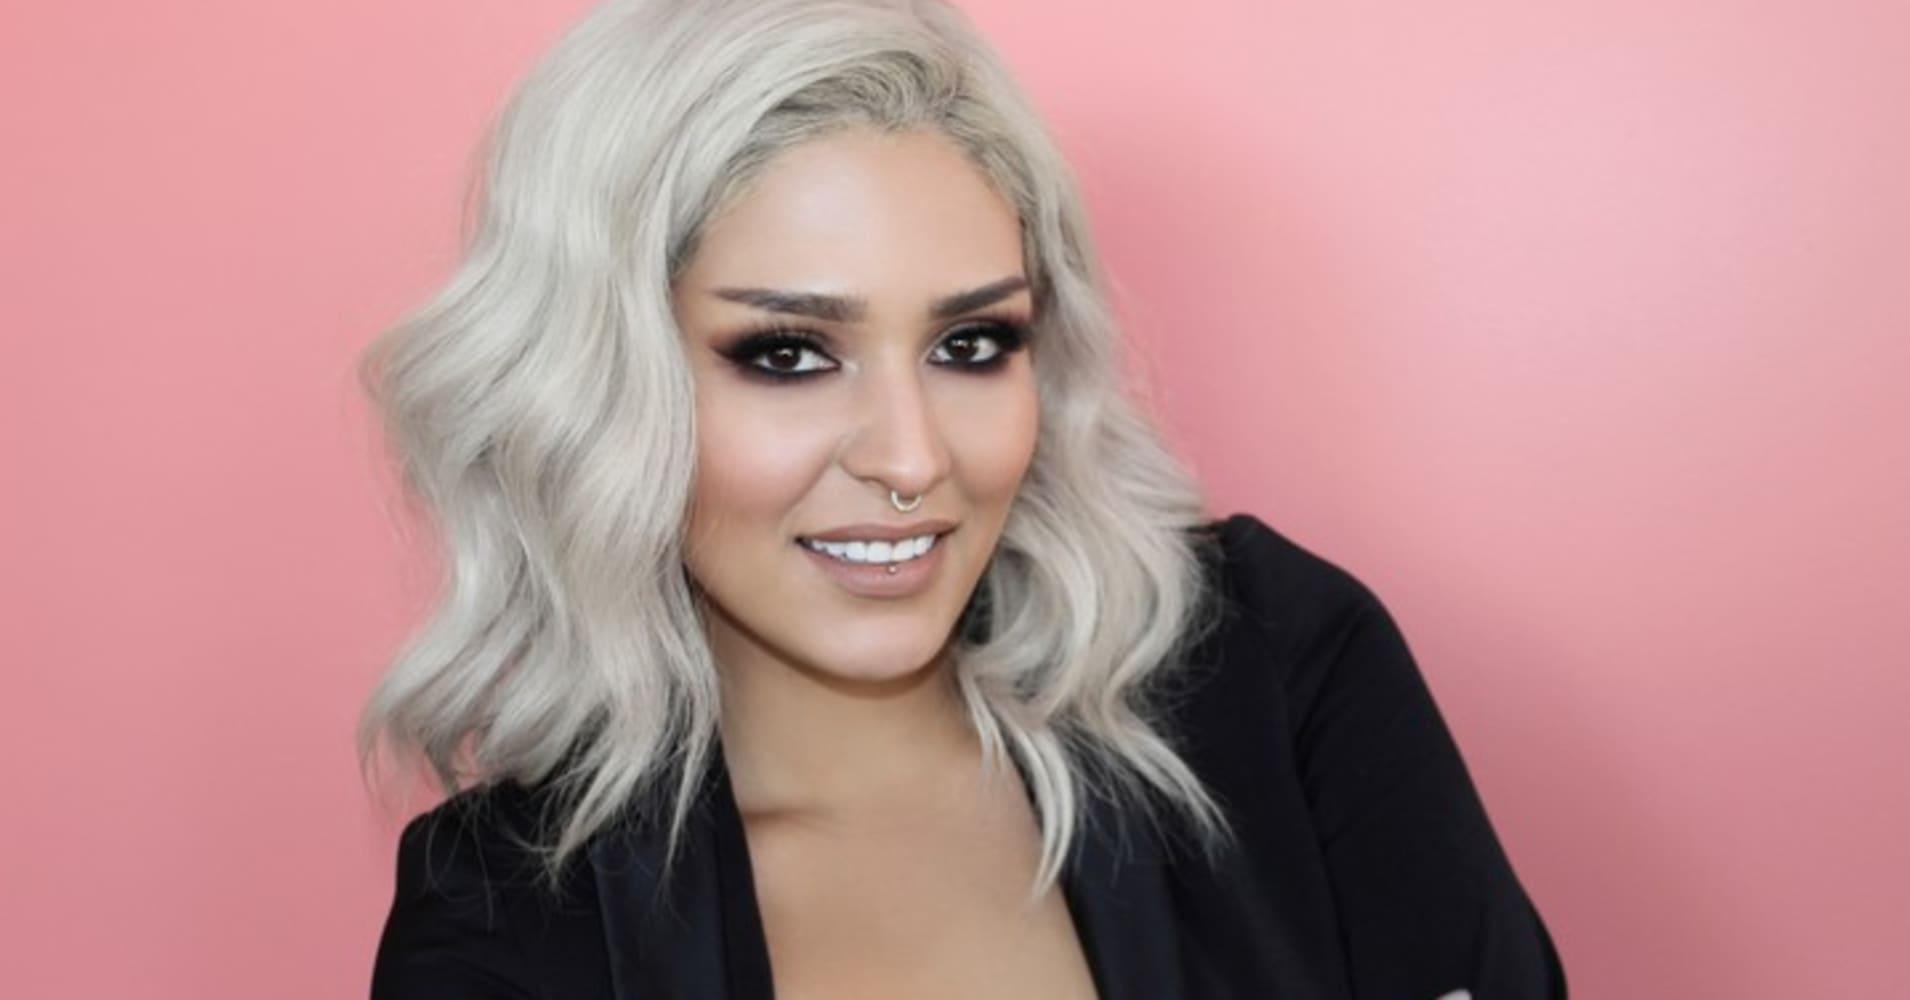 CEO of Melt Cosmetics Lora Arellano has used social media to help build her company.